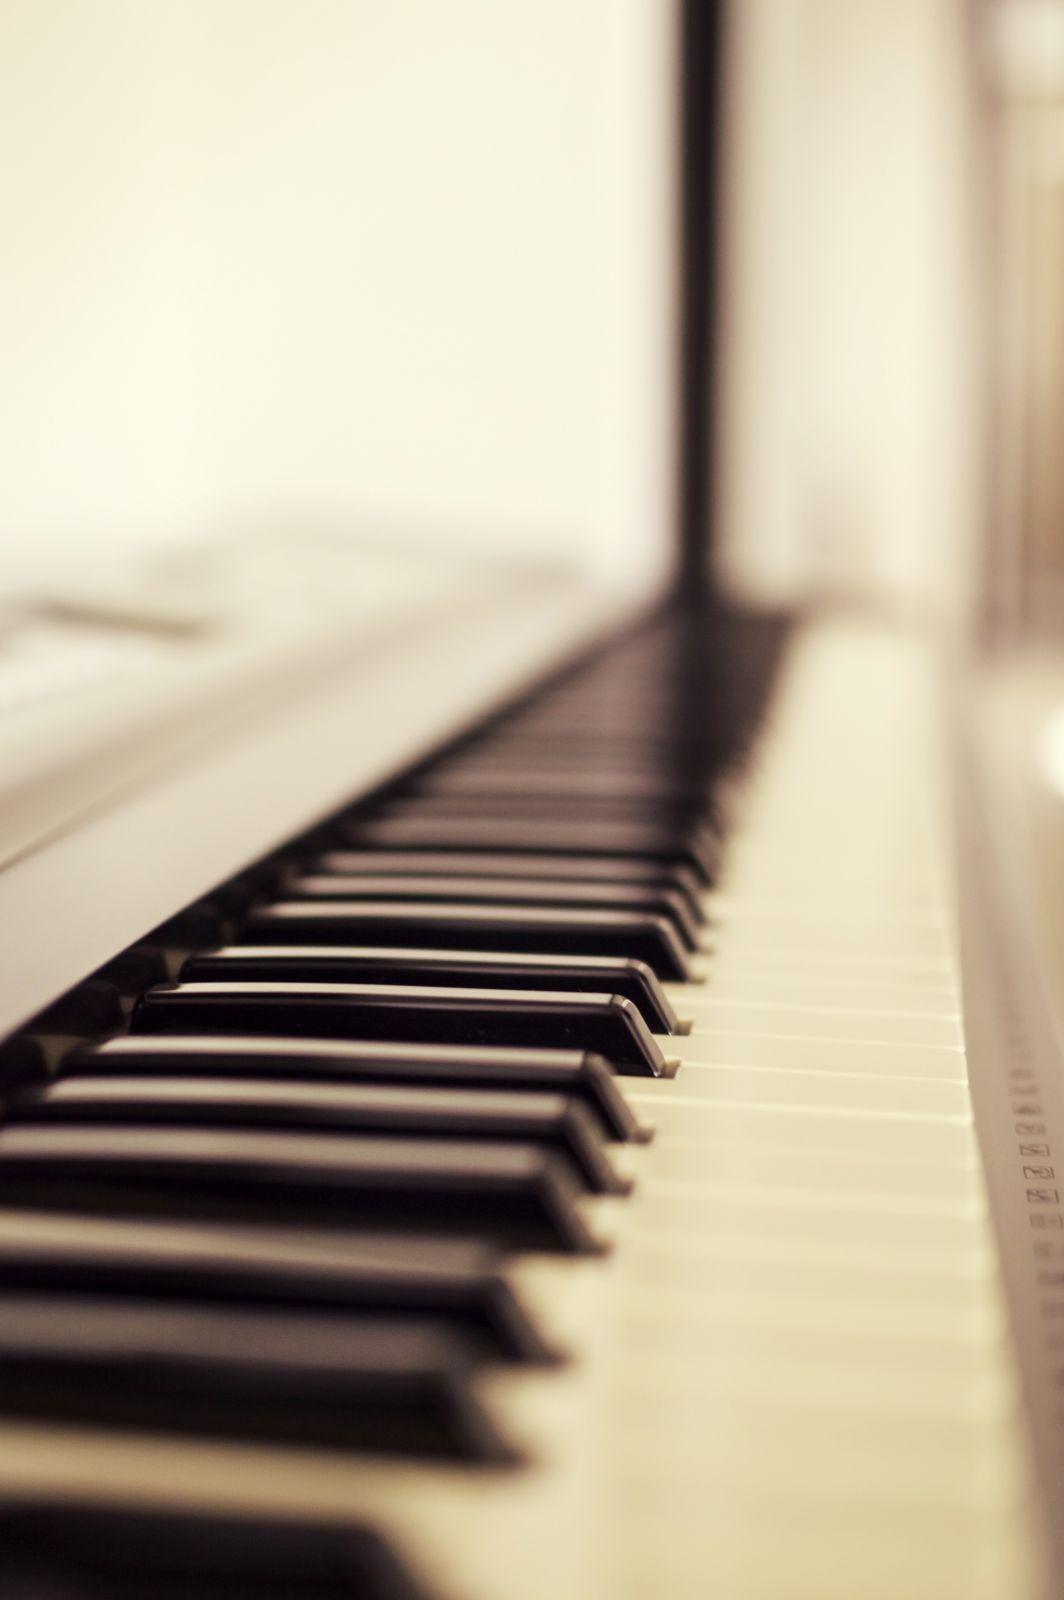 Download Piano Wallpaper 4K PNG